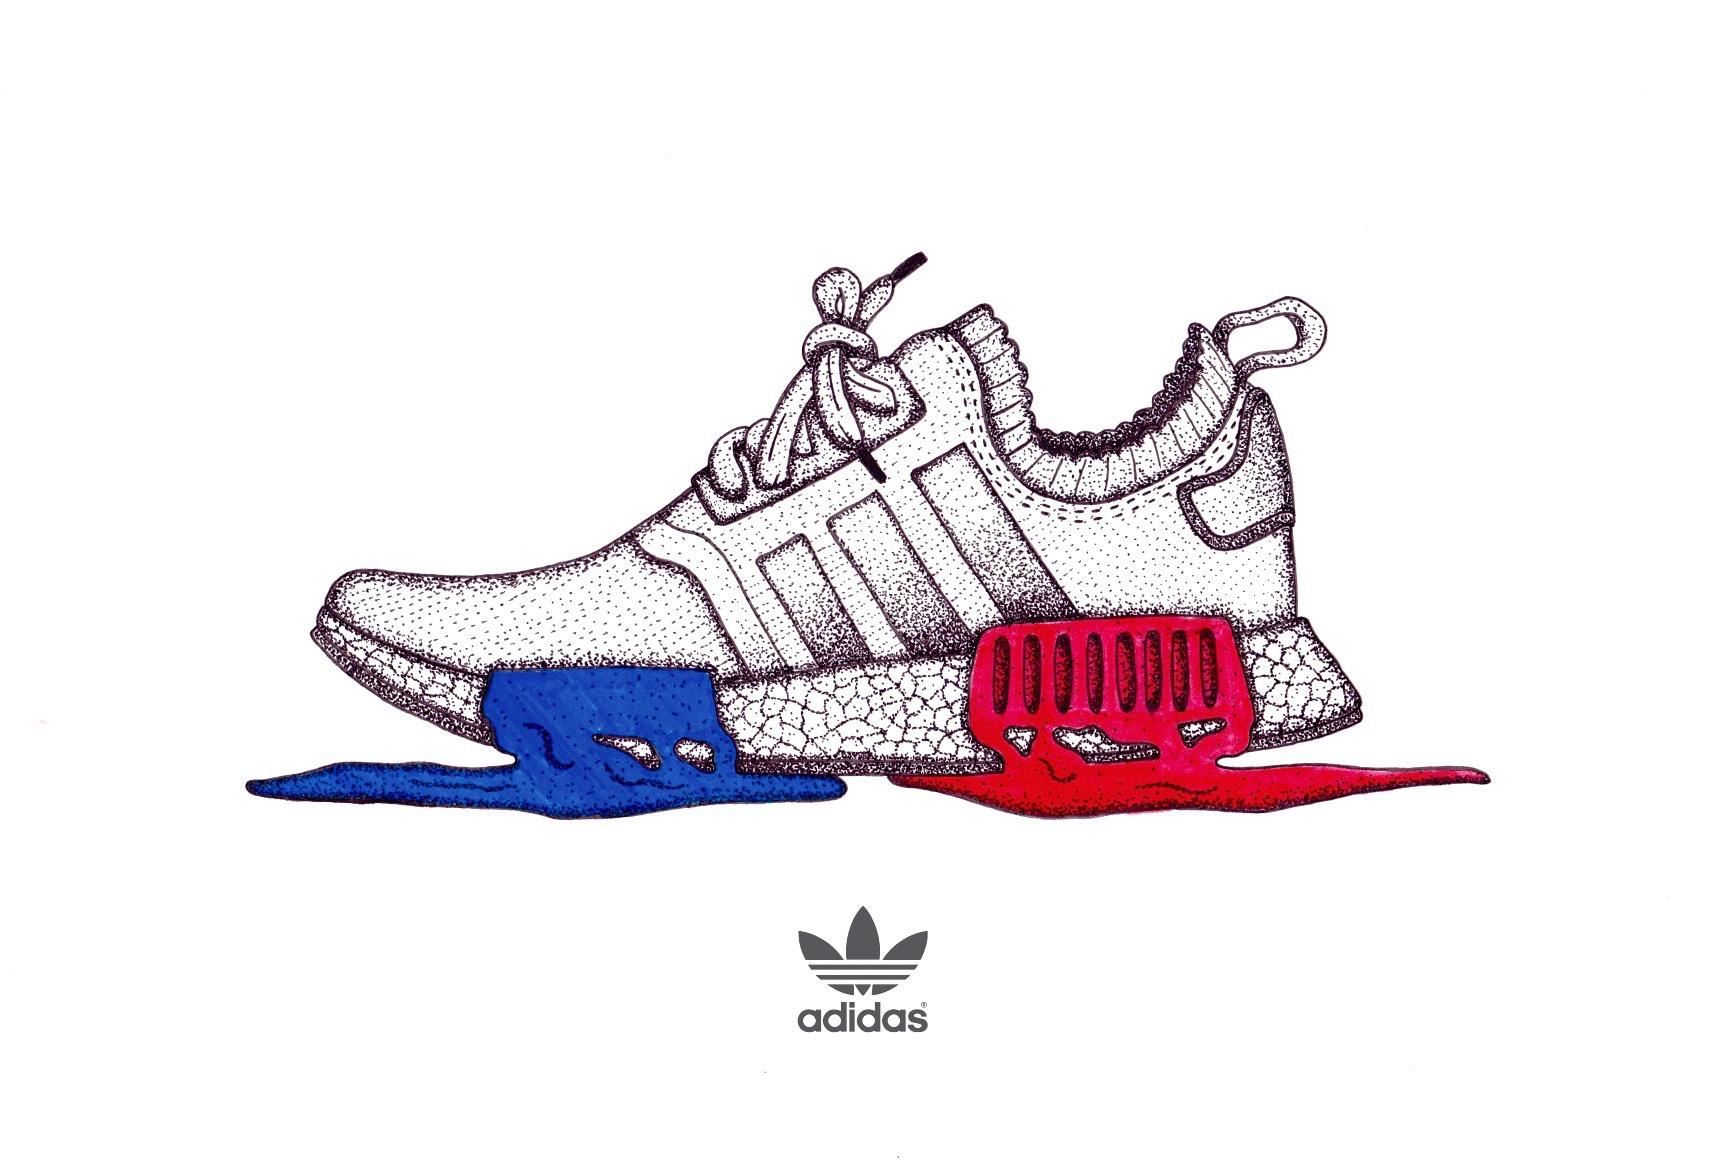 Adidas NMD on Behance